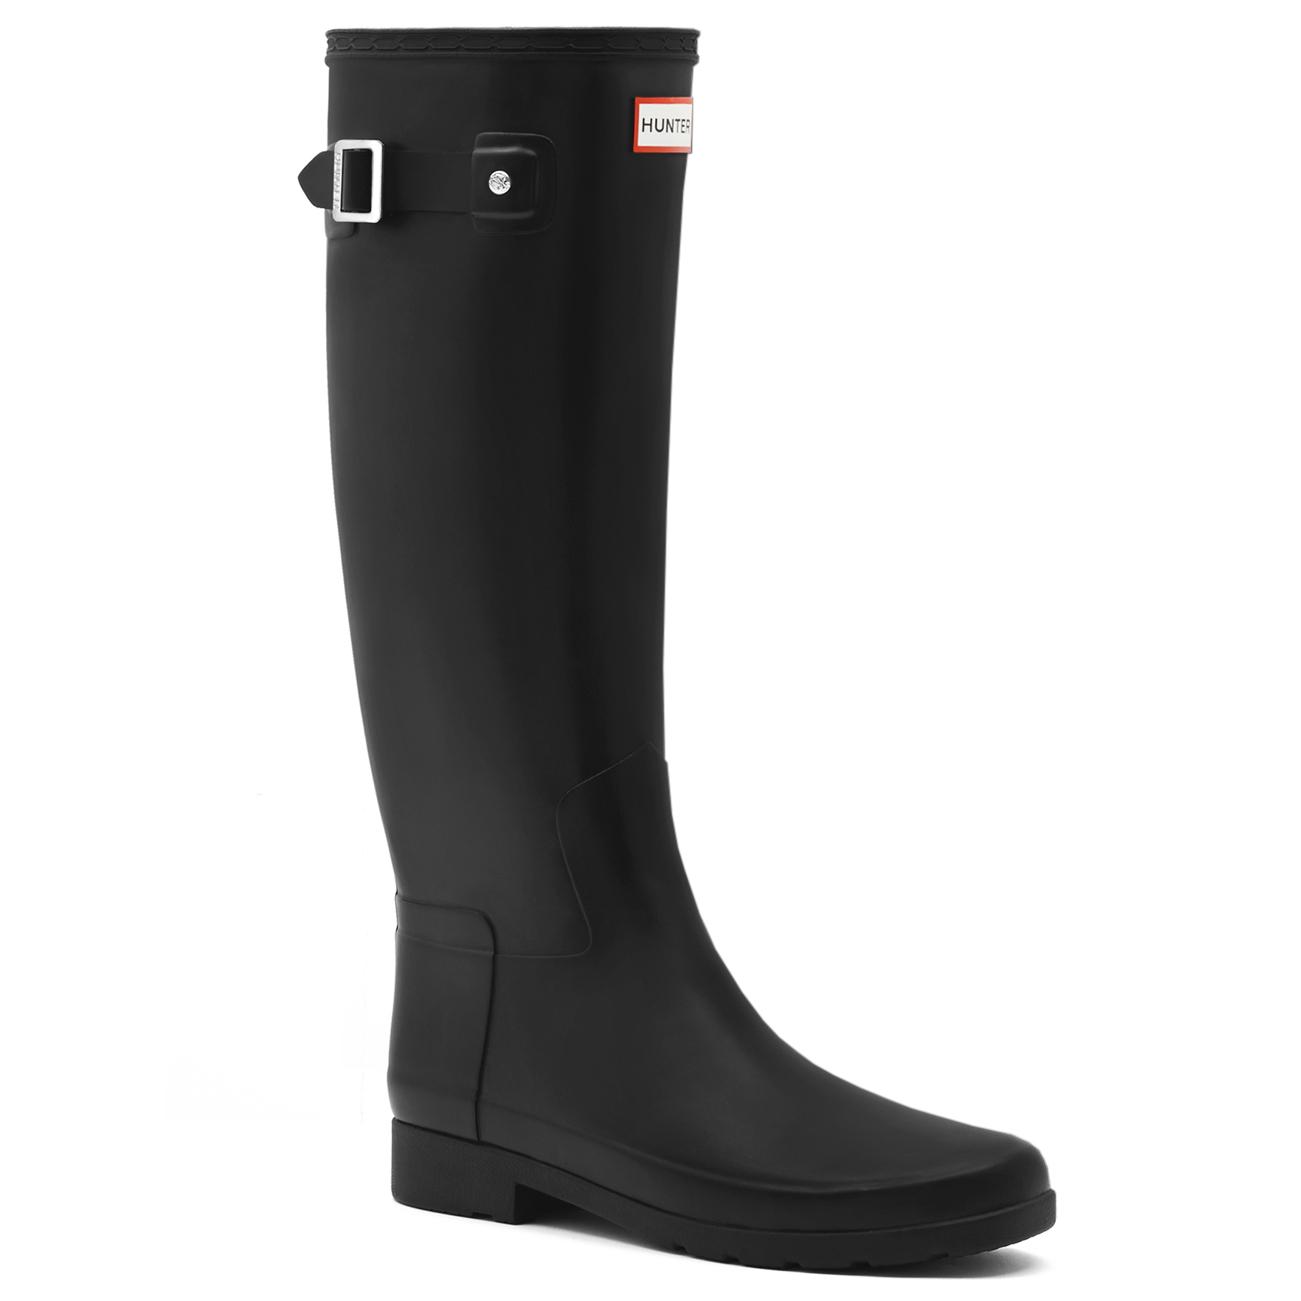 ed34750f0687 Womens Hunter Original Refined Waterproof Snow Wellingtons Rain Boots US  5-11